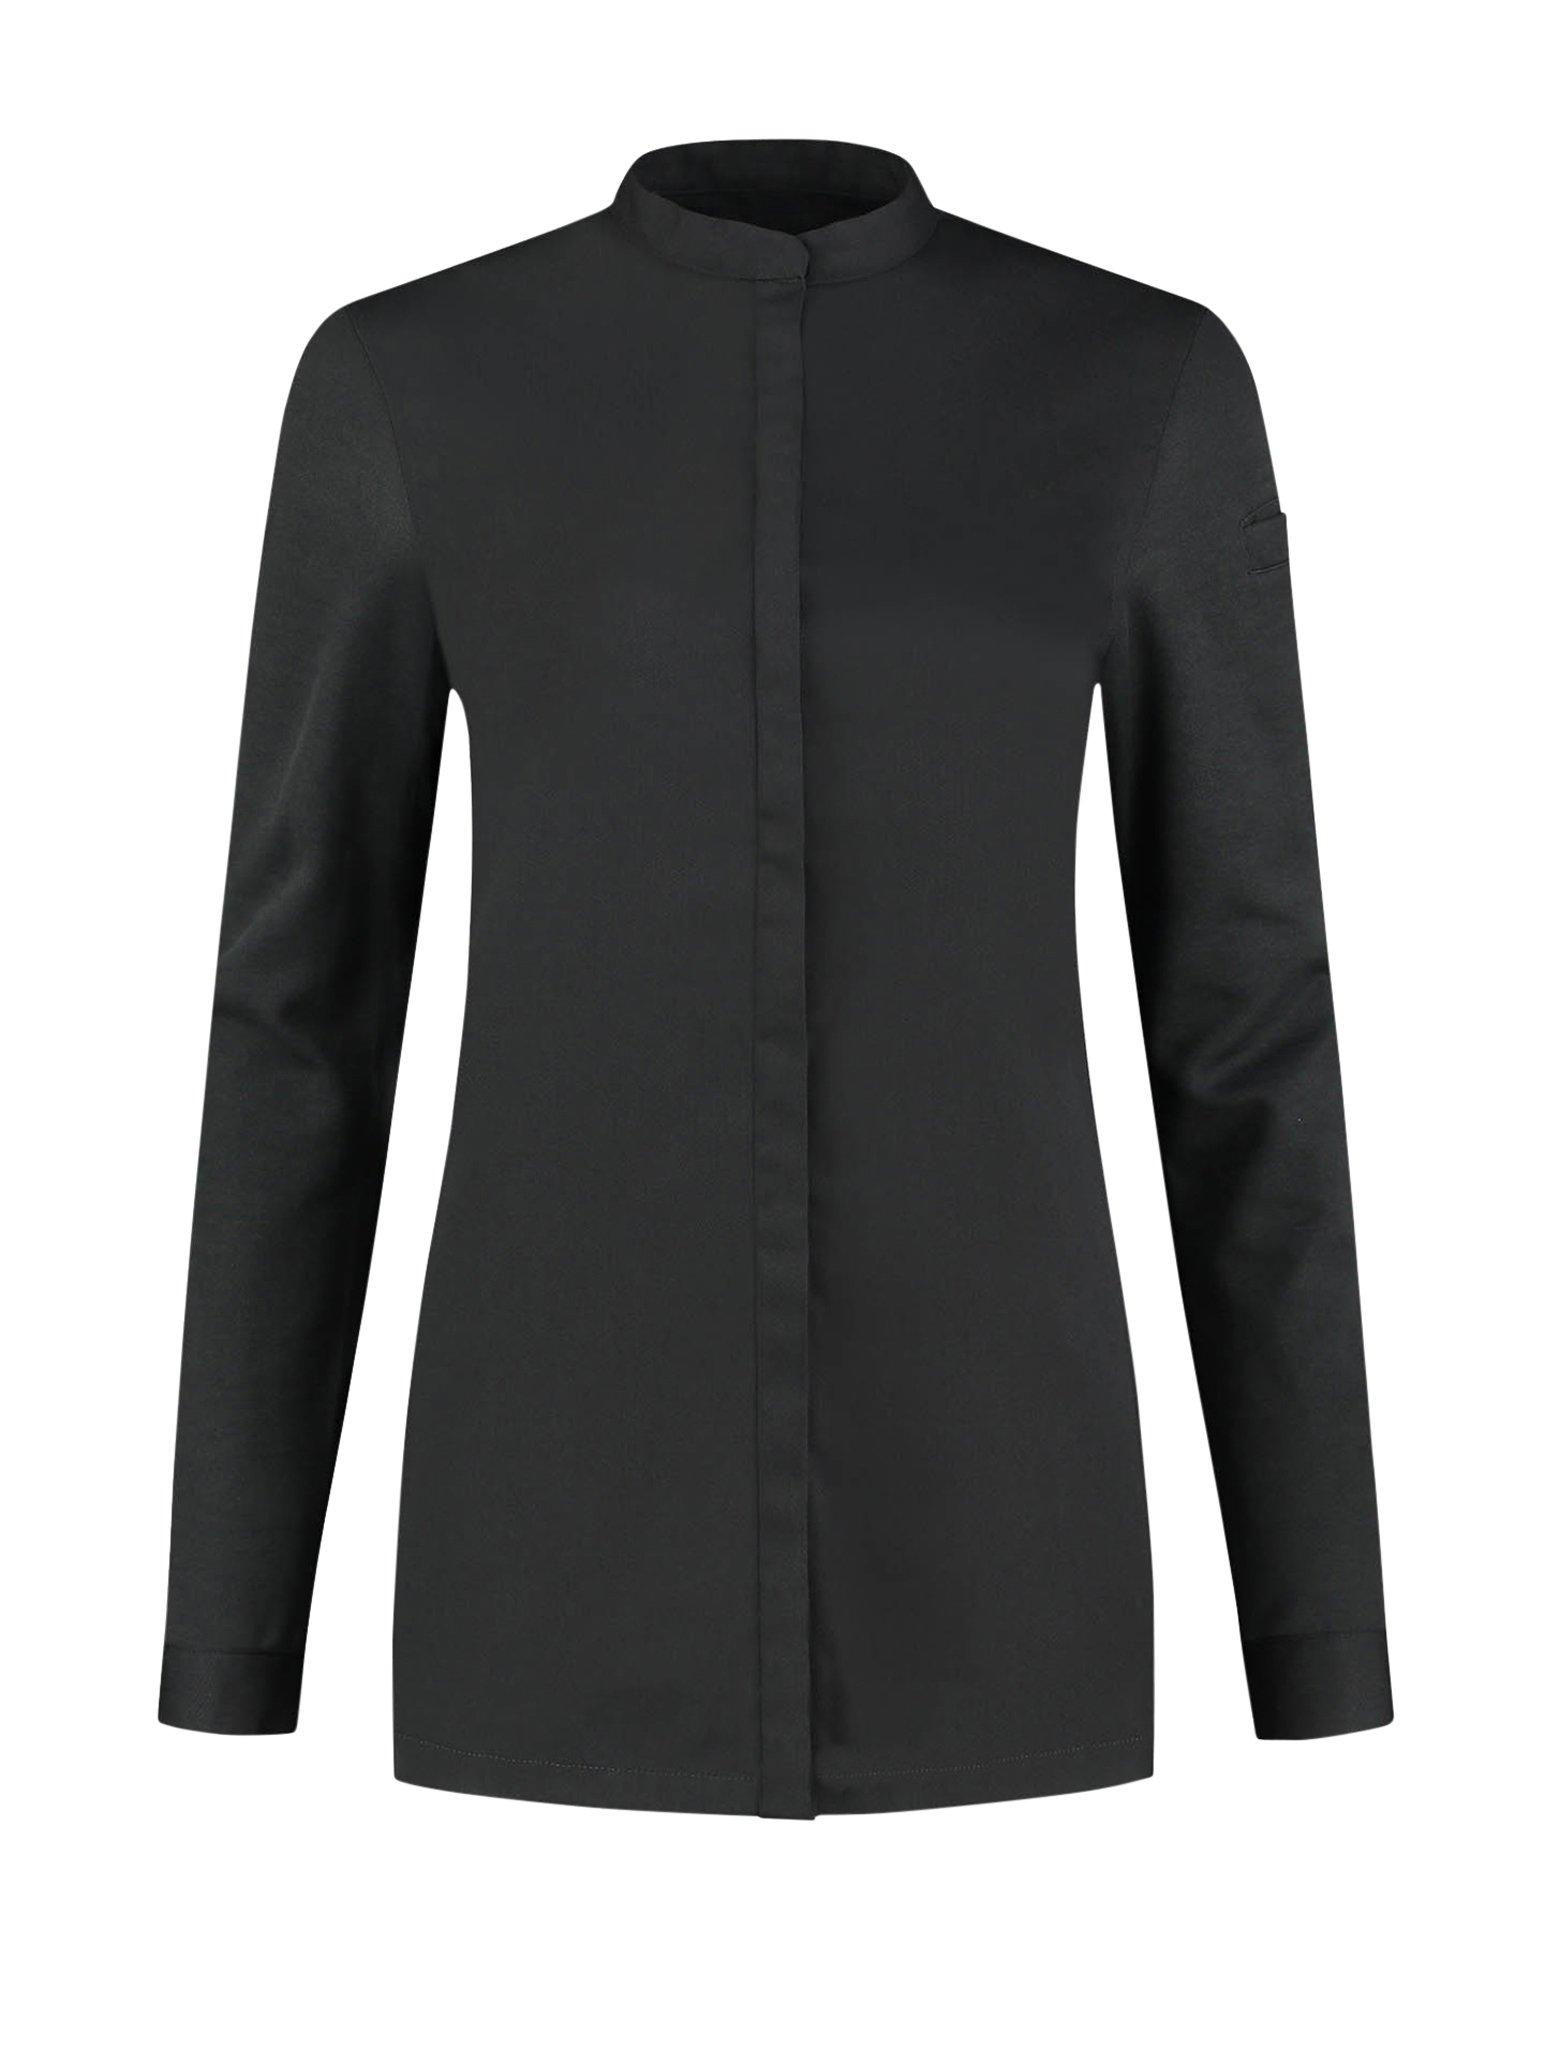 Chef Jacket Jolie Black